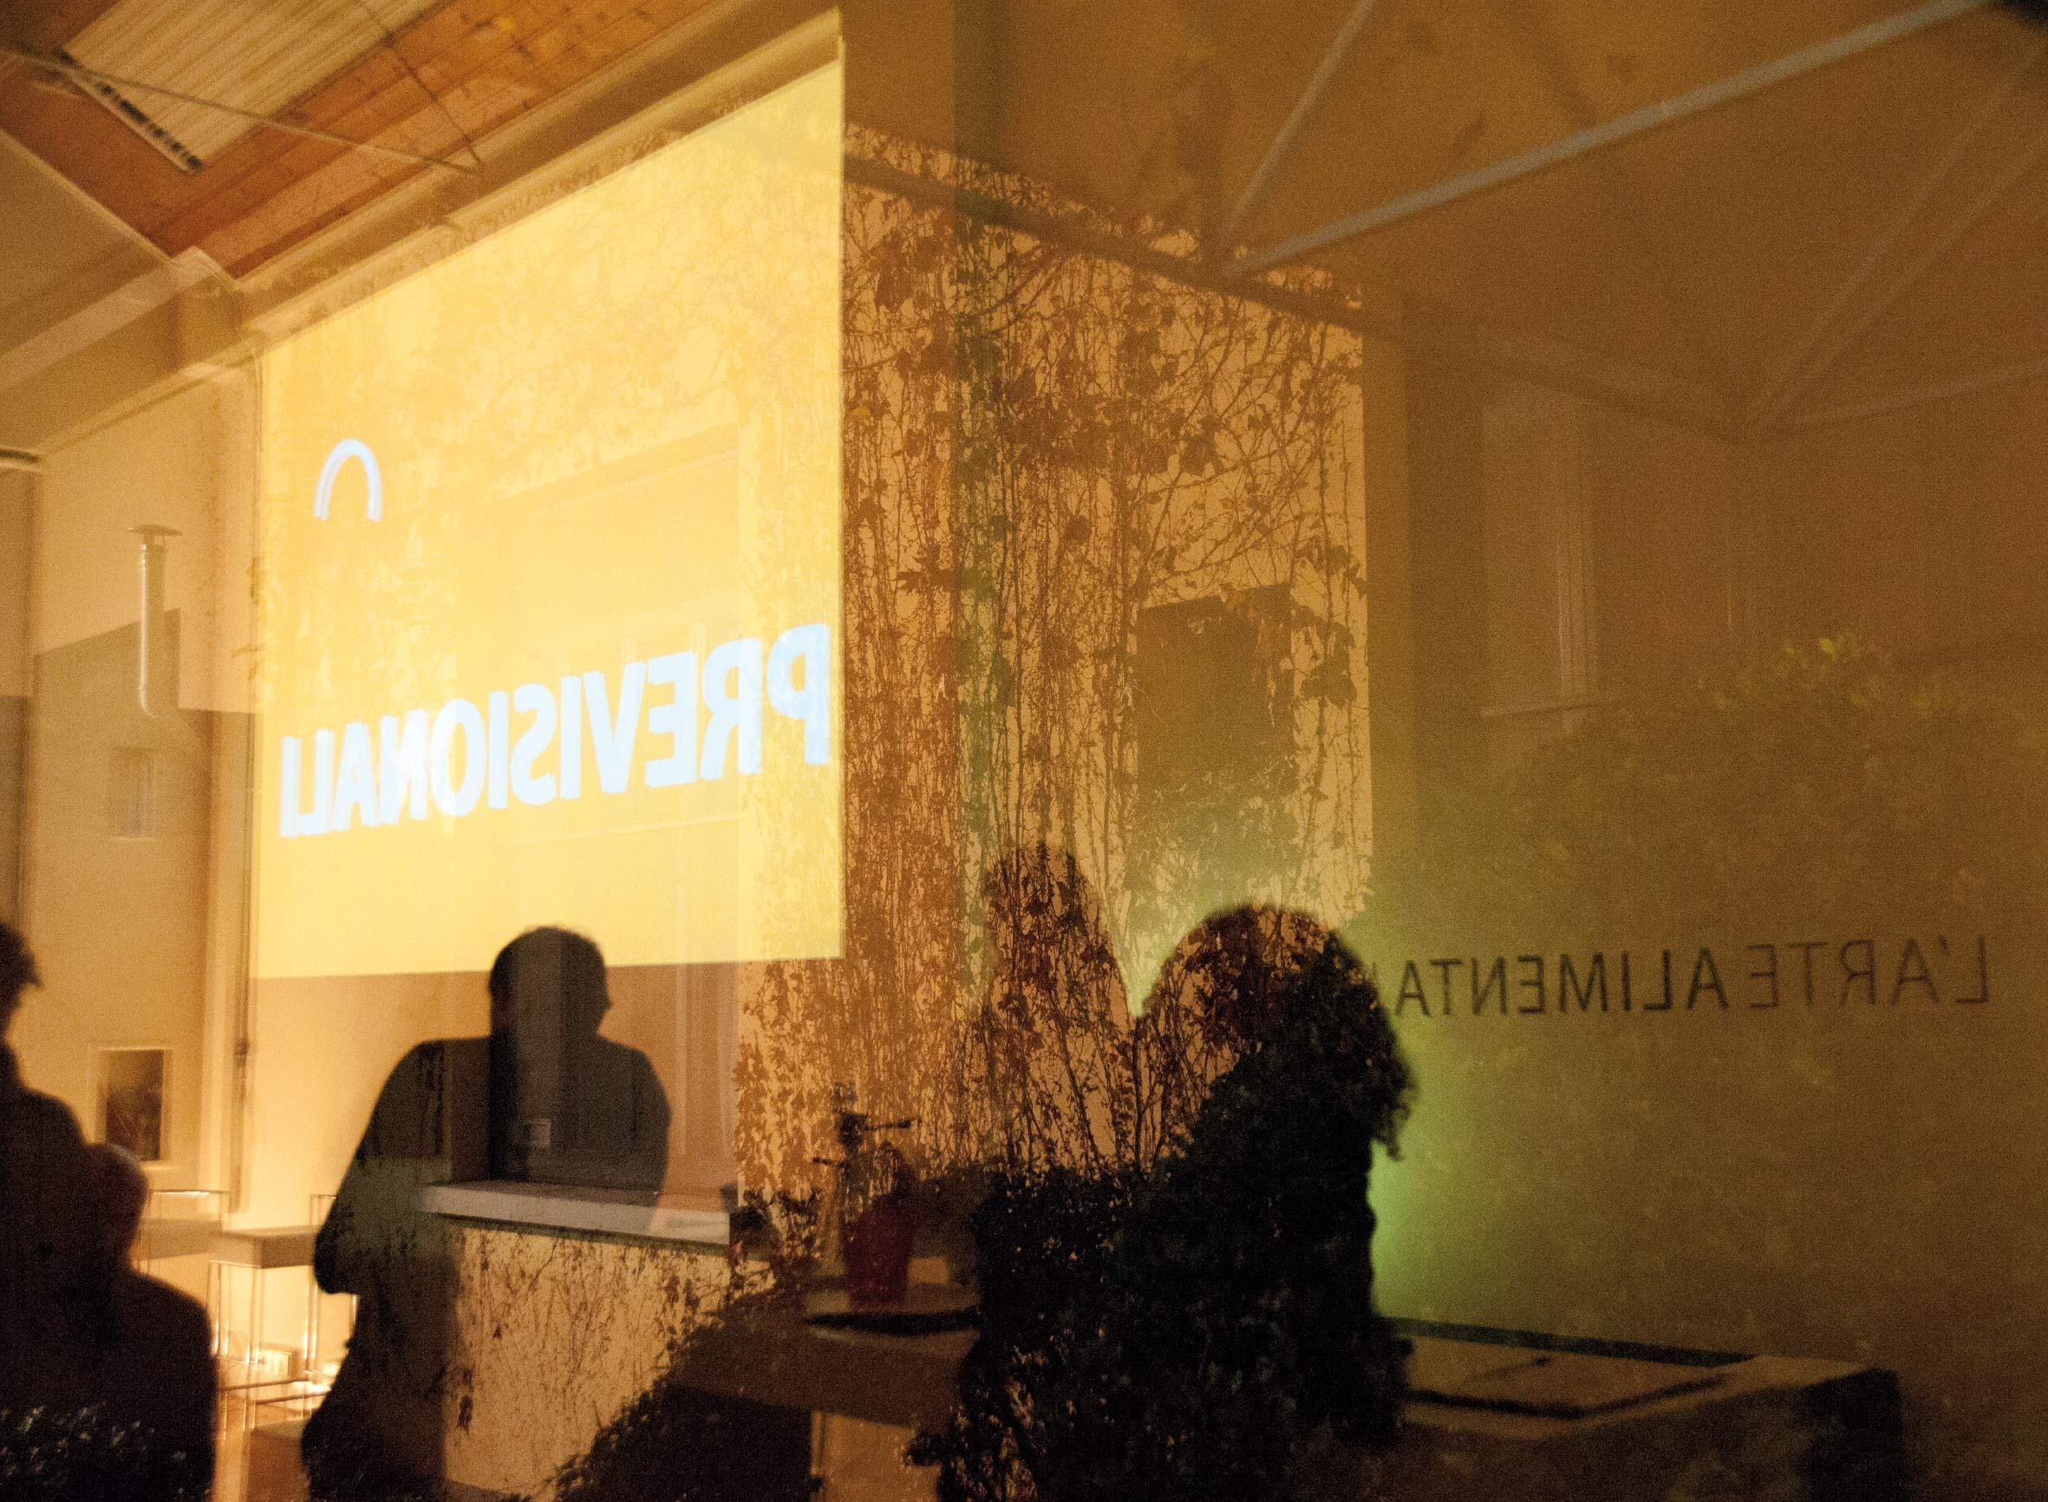 SC-studio-chiesa-communication_culture-Nutrimentum_Castelvecchio_09